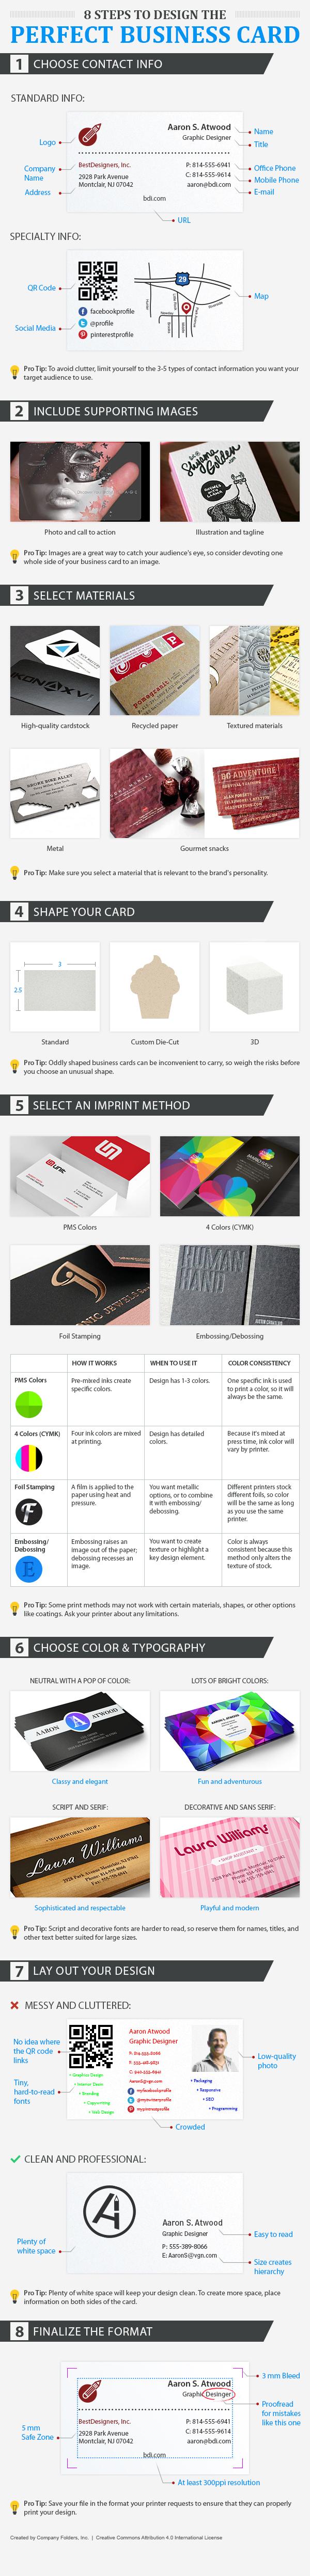 Business Card Design Tips